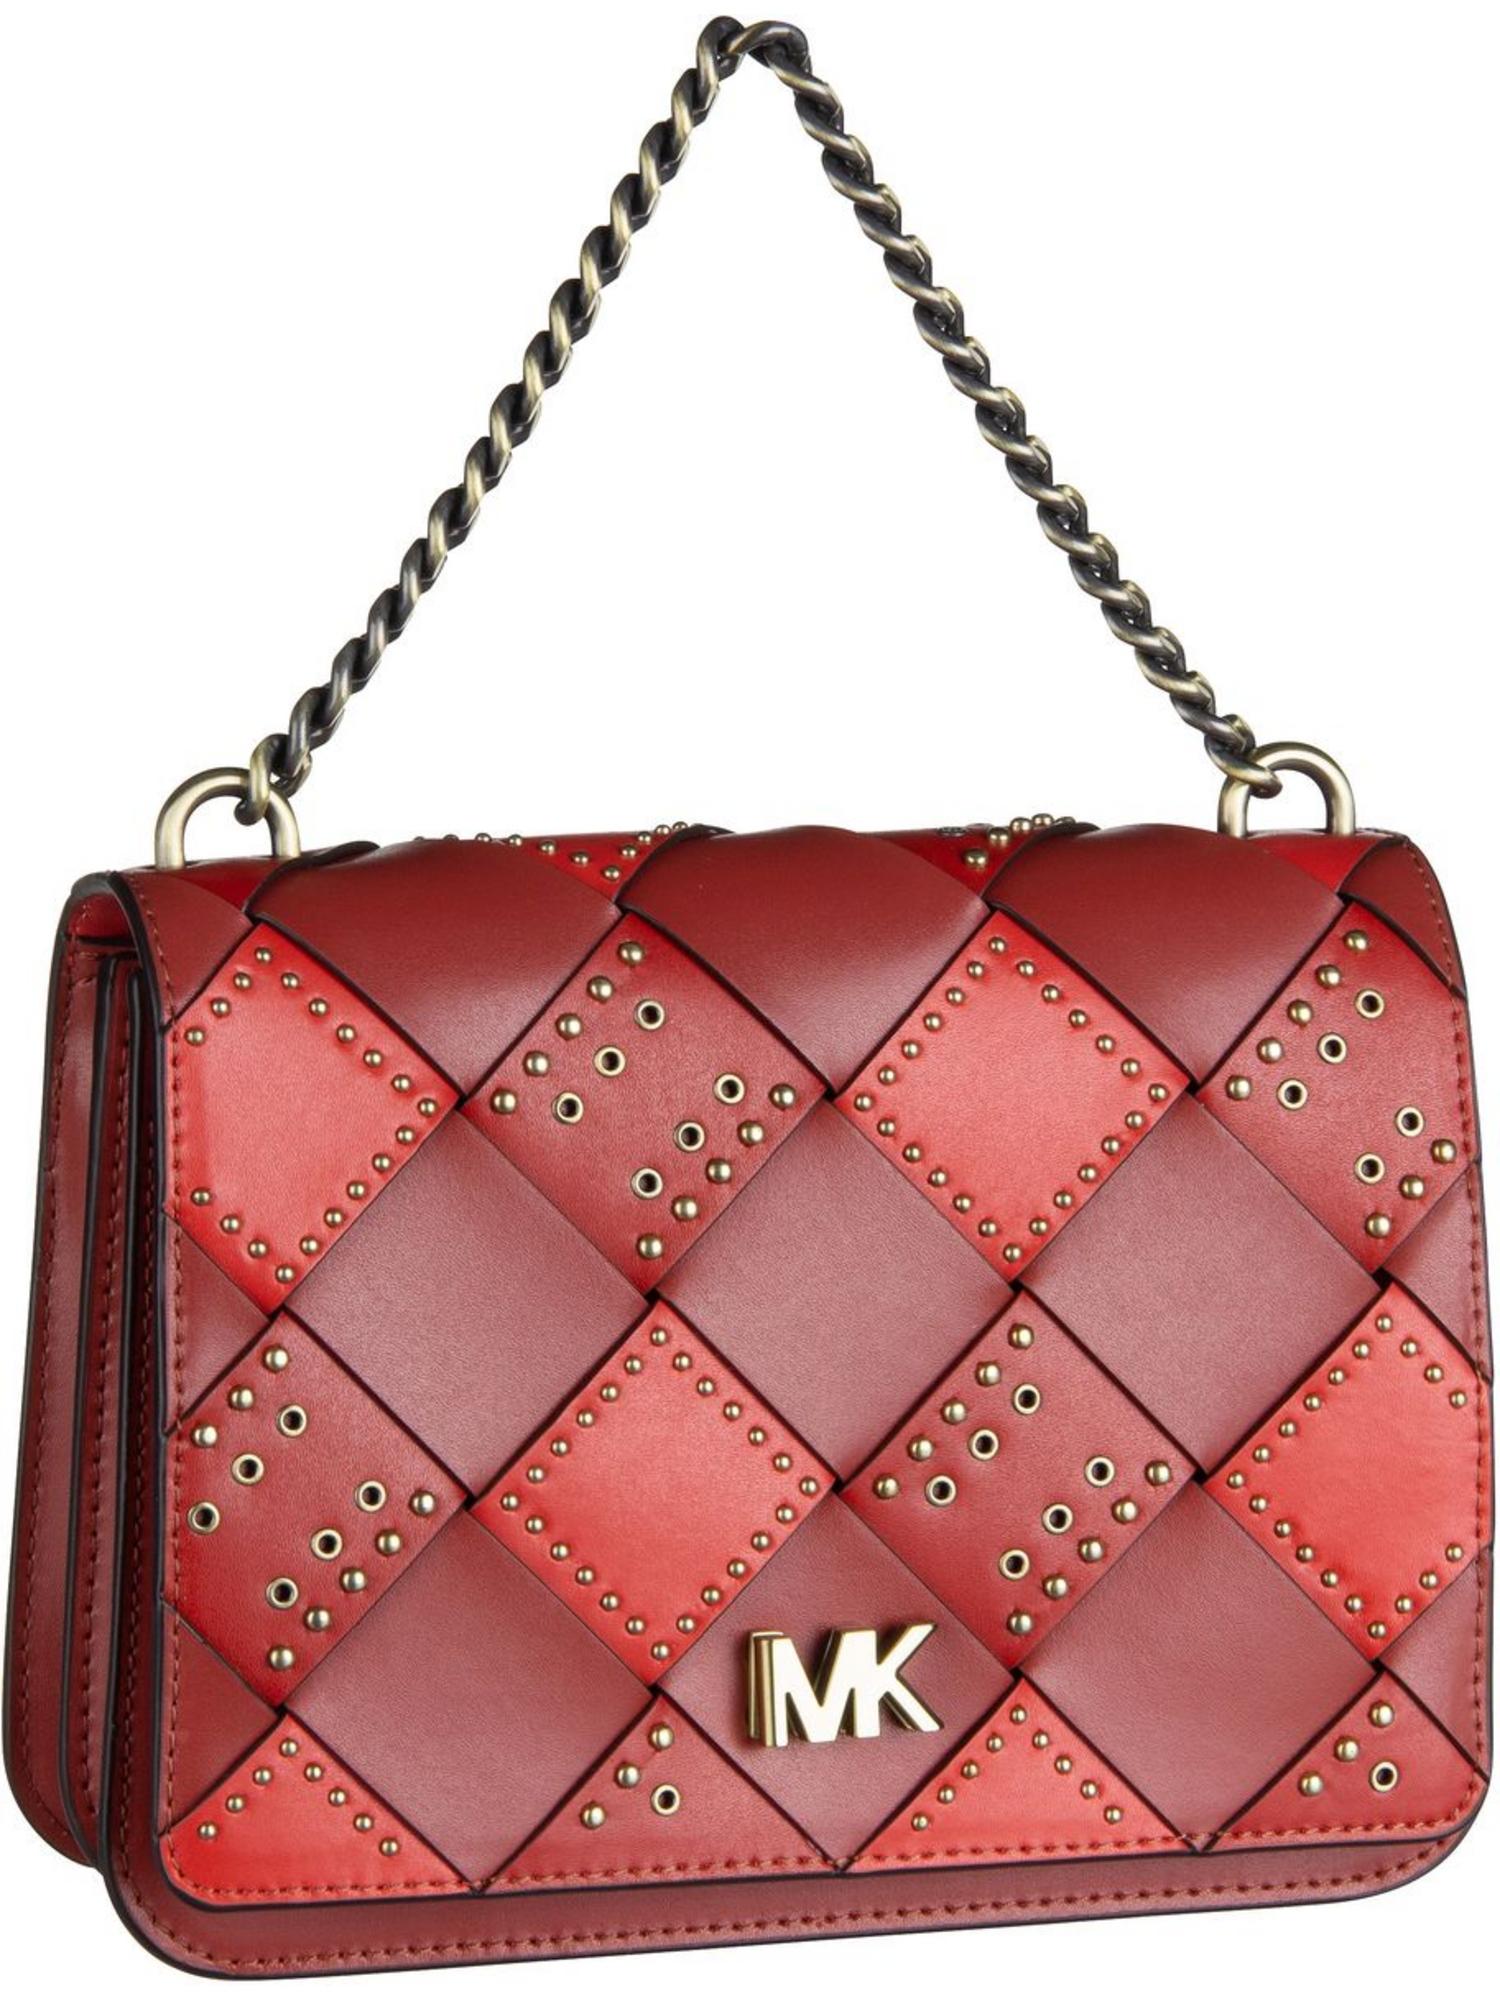 Michael Kors Mott Large Chain Swag Shoulderbag